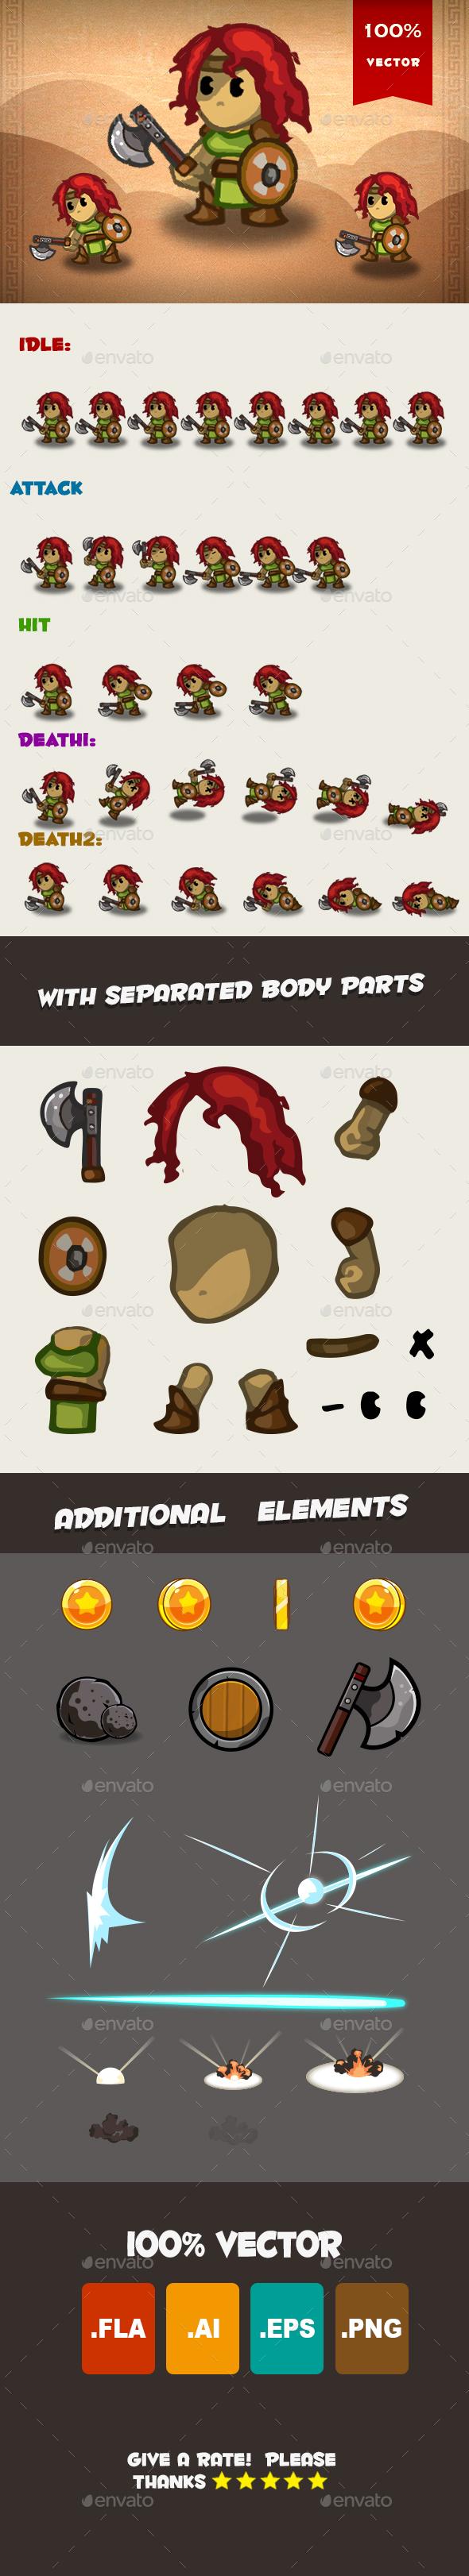 Barbarian Spritesheet 01 - Sprites Game Assets